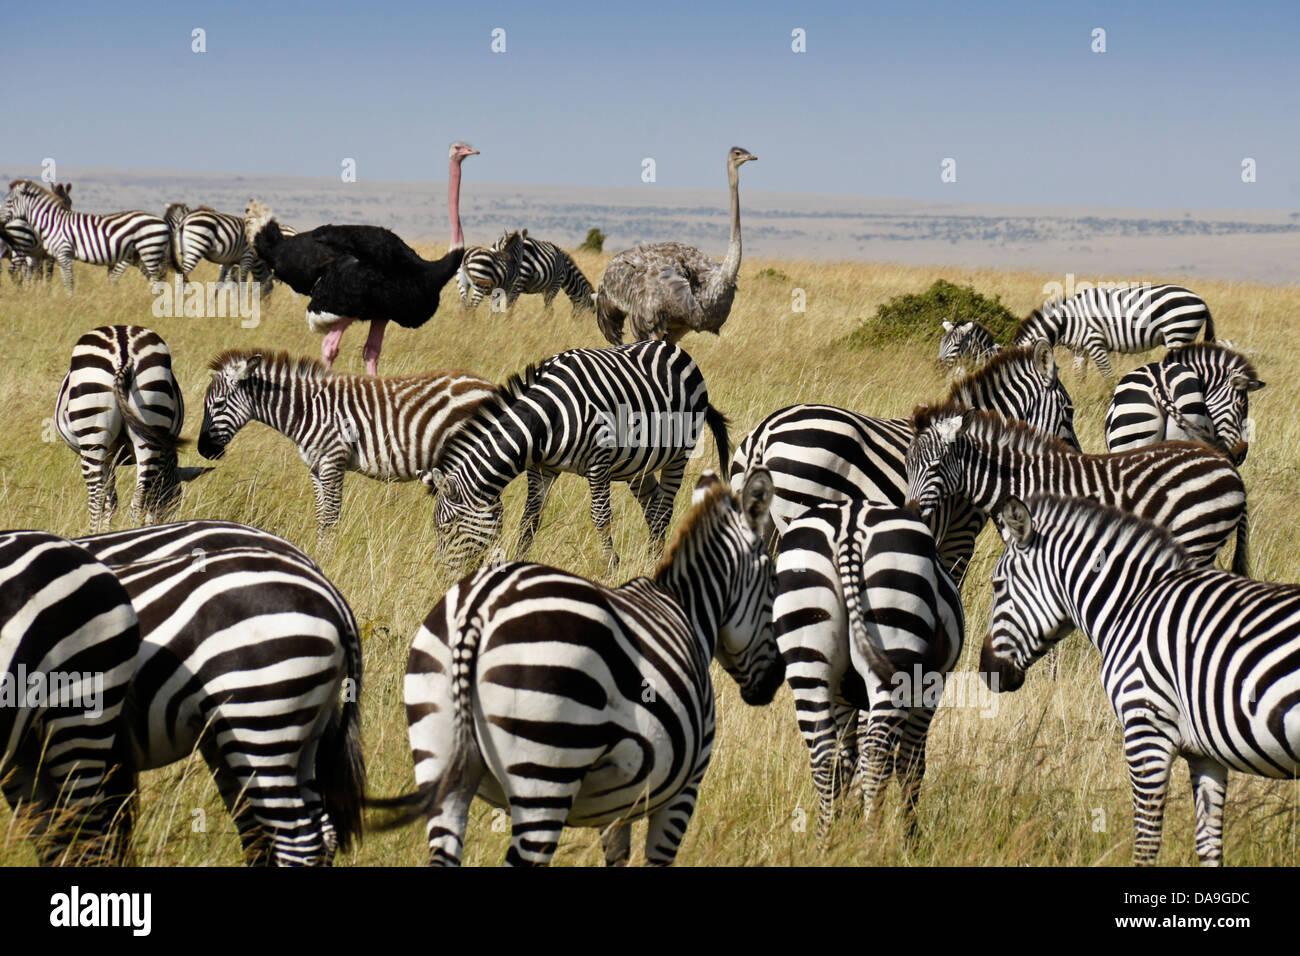 Burchell's zebras and Masai ostriches, Masai Mara, Kenya - Stock Image